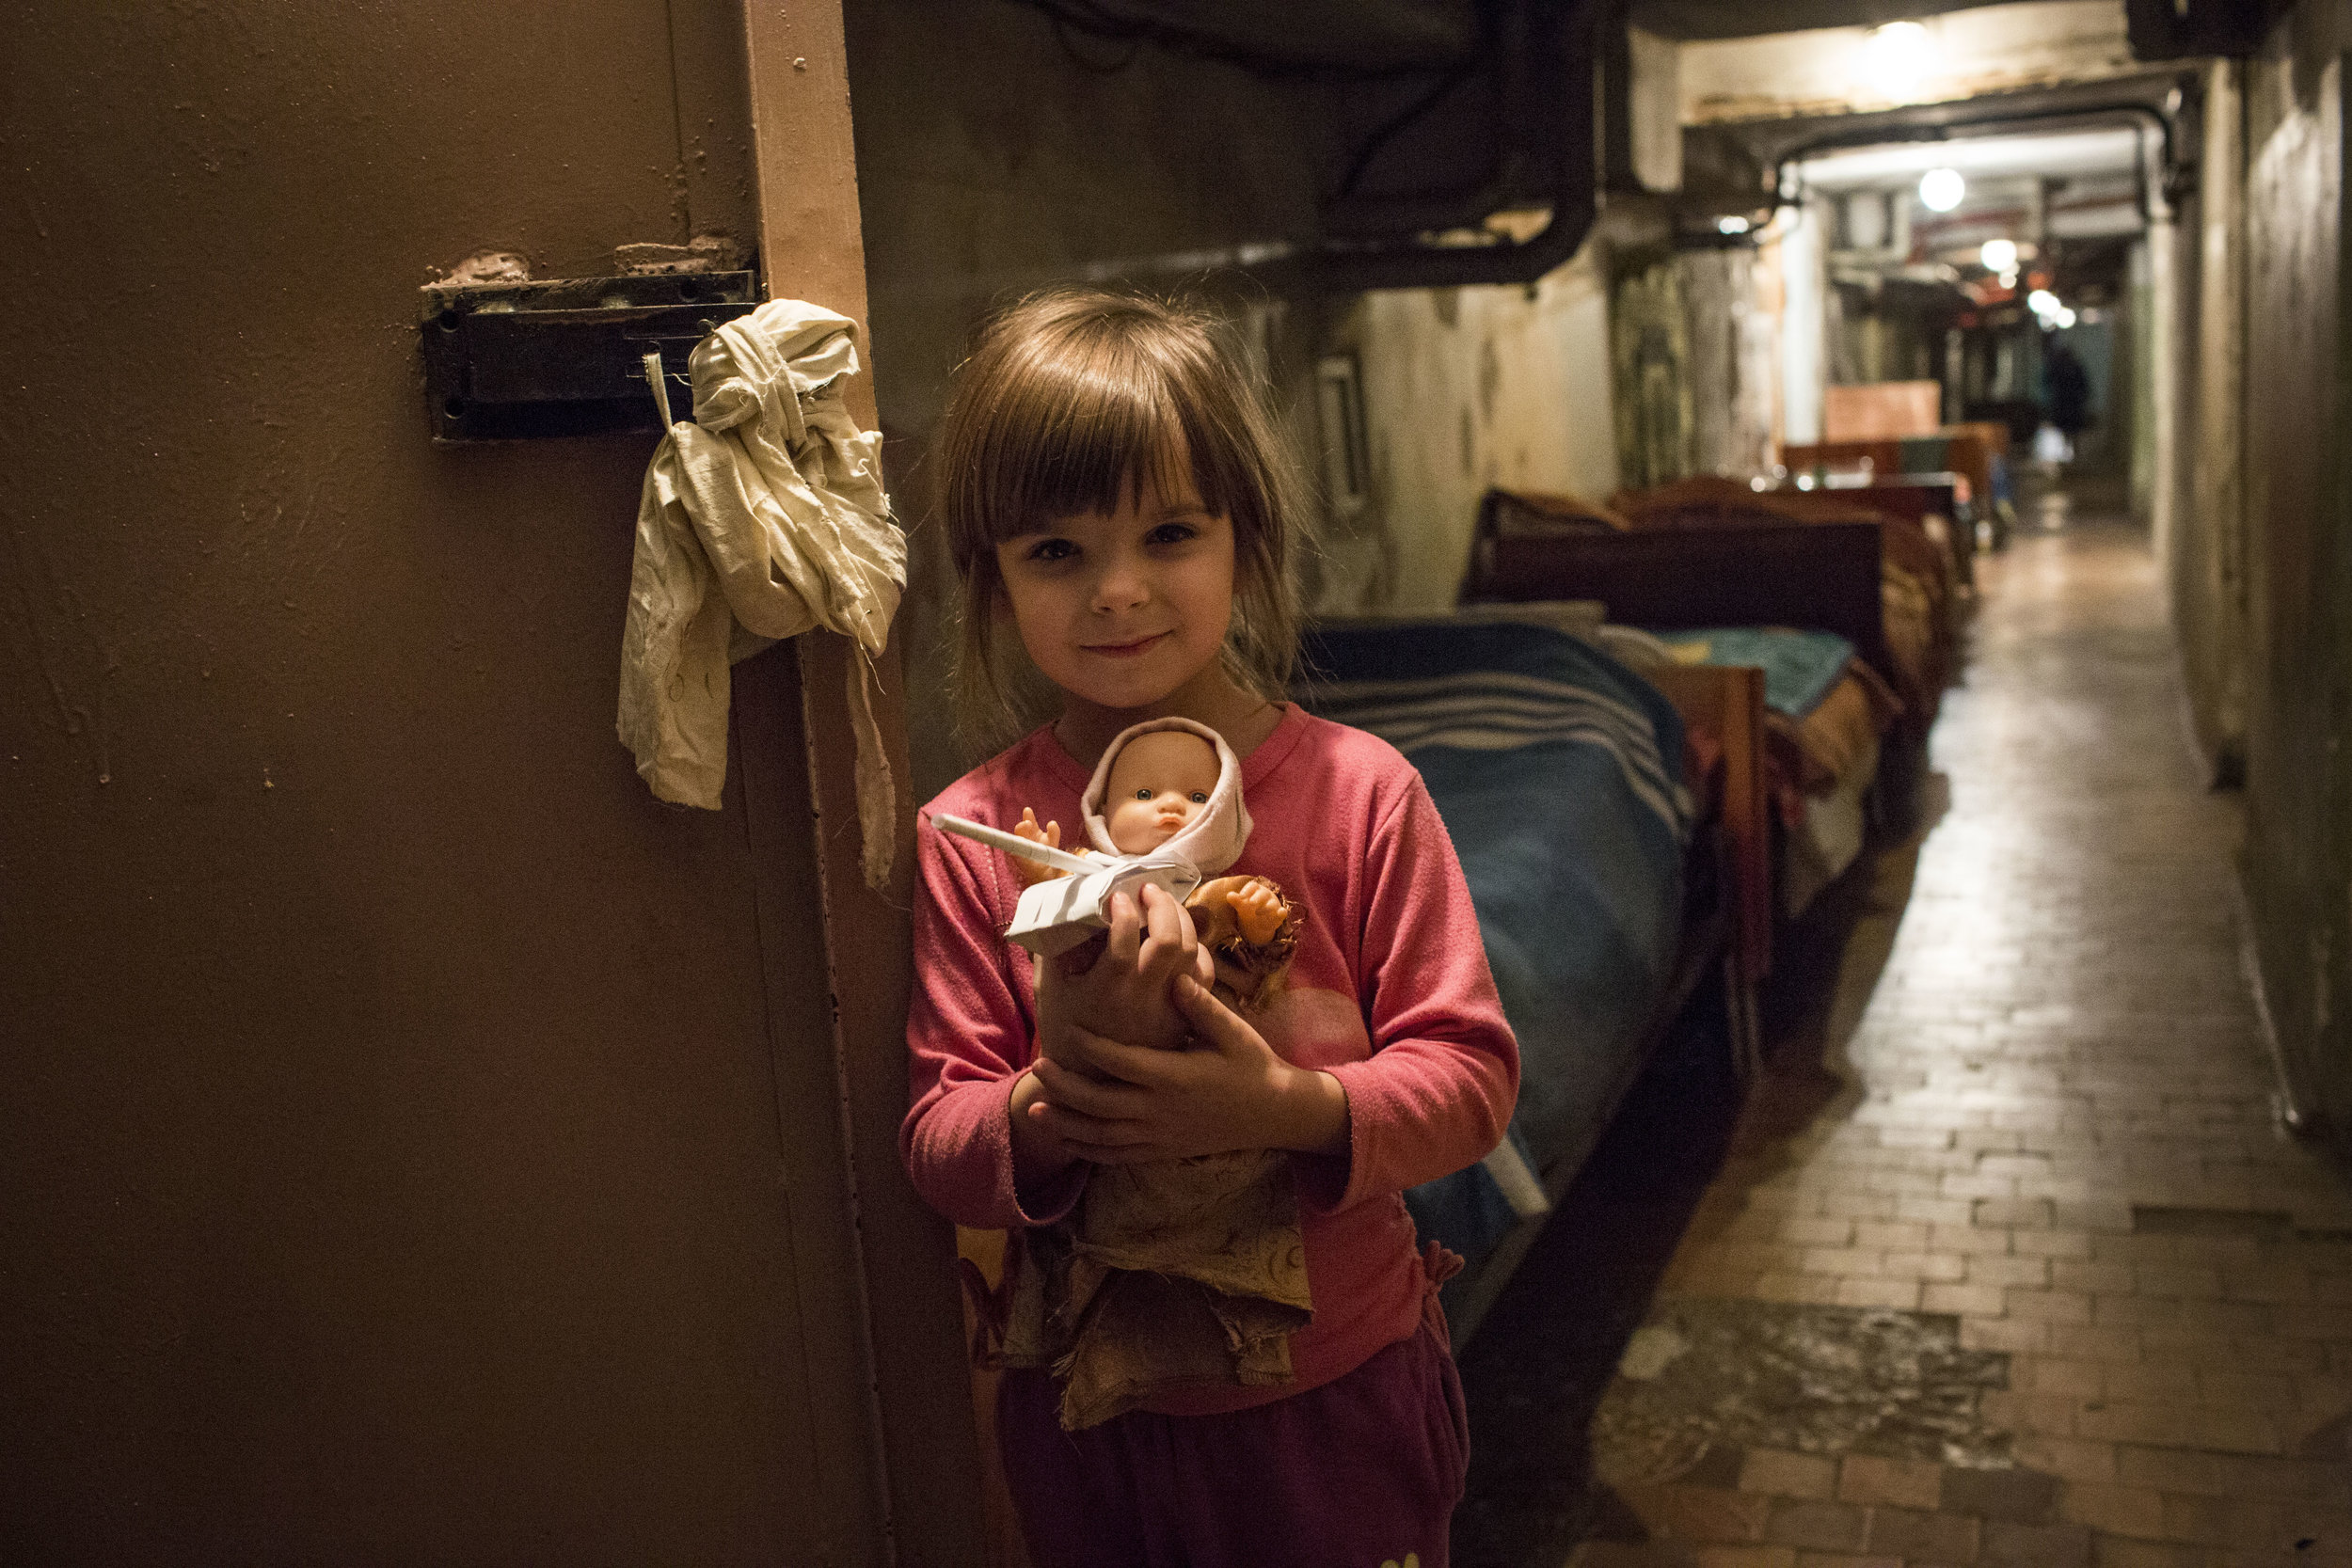 FRANCESCAVOLPI_UNICEF_EASTERN UKRAINE27.jpg